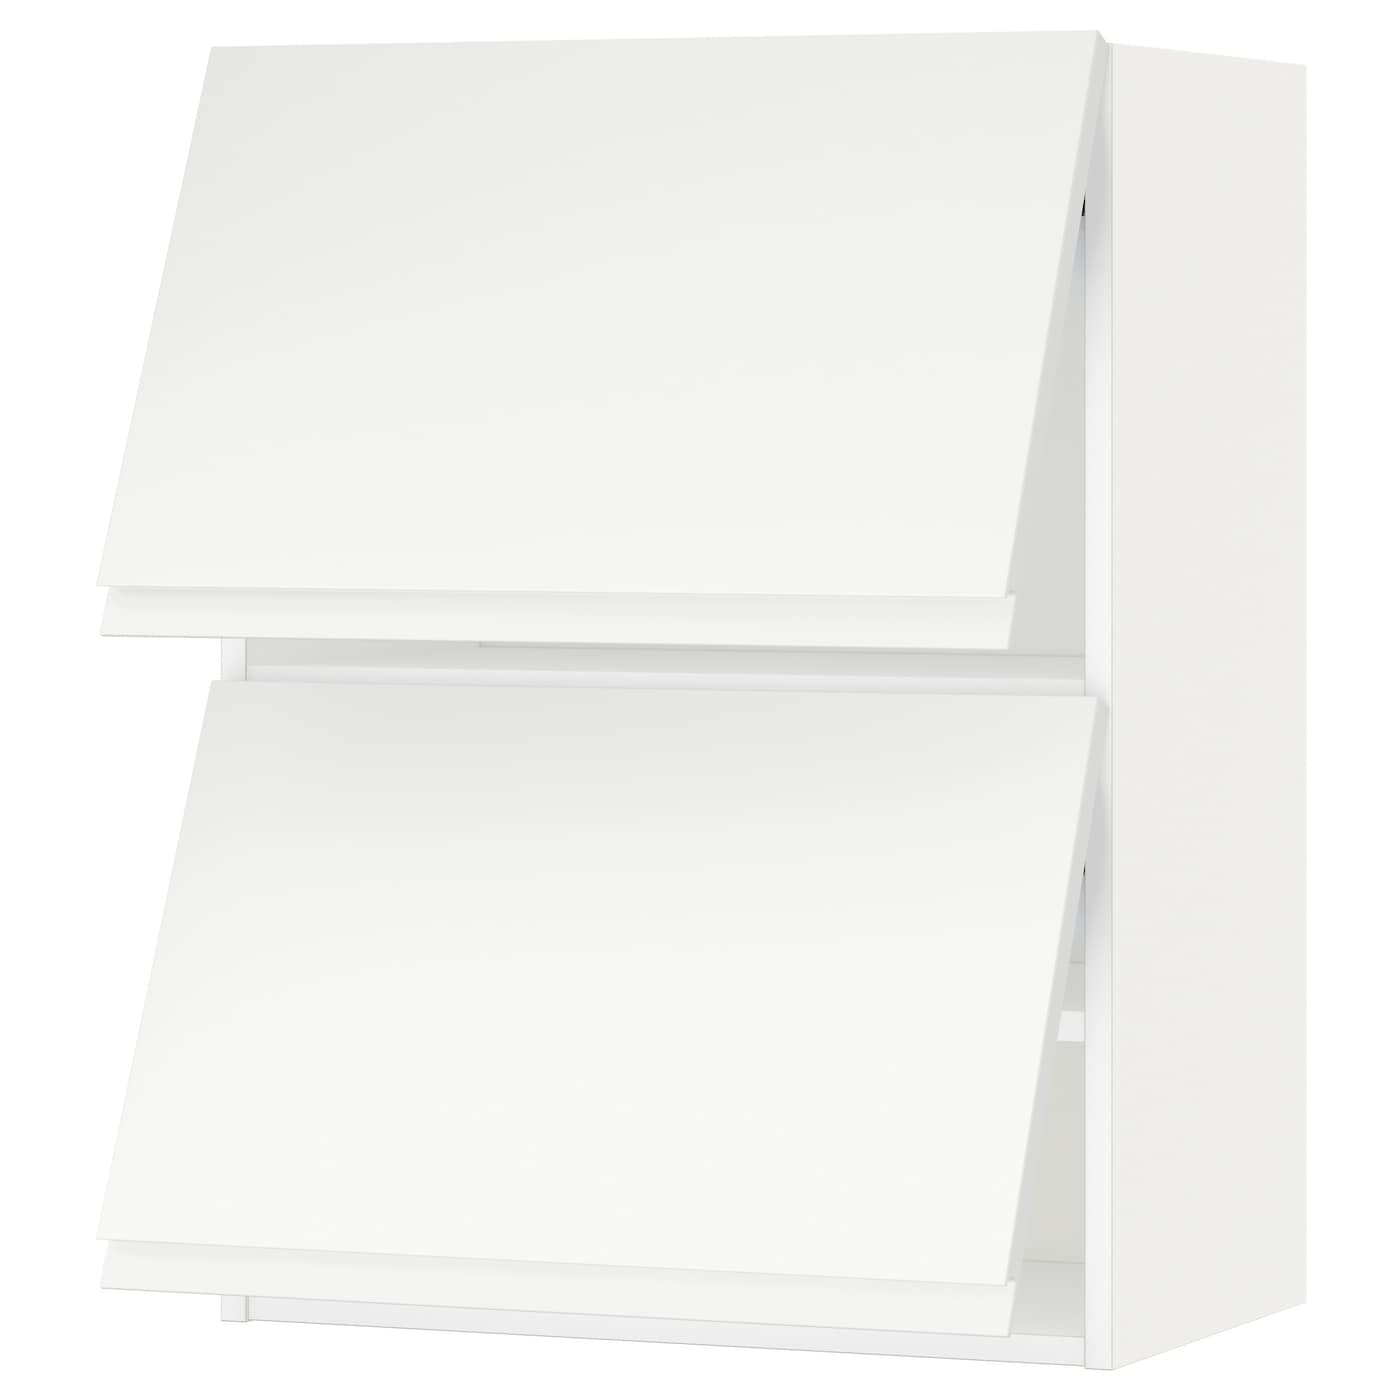 IKEA METOD wall cabinet horizontal w 2 doors Door lift with catch for gentle closing included